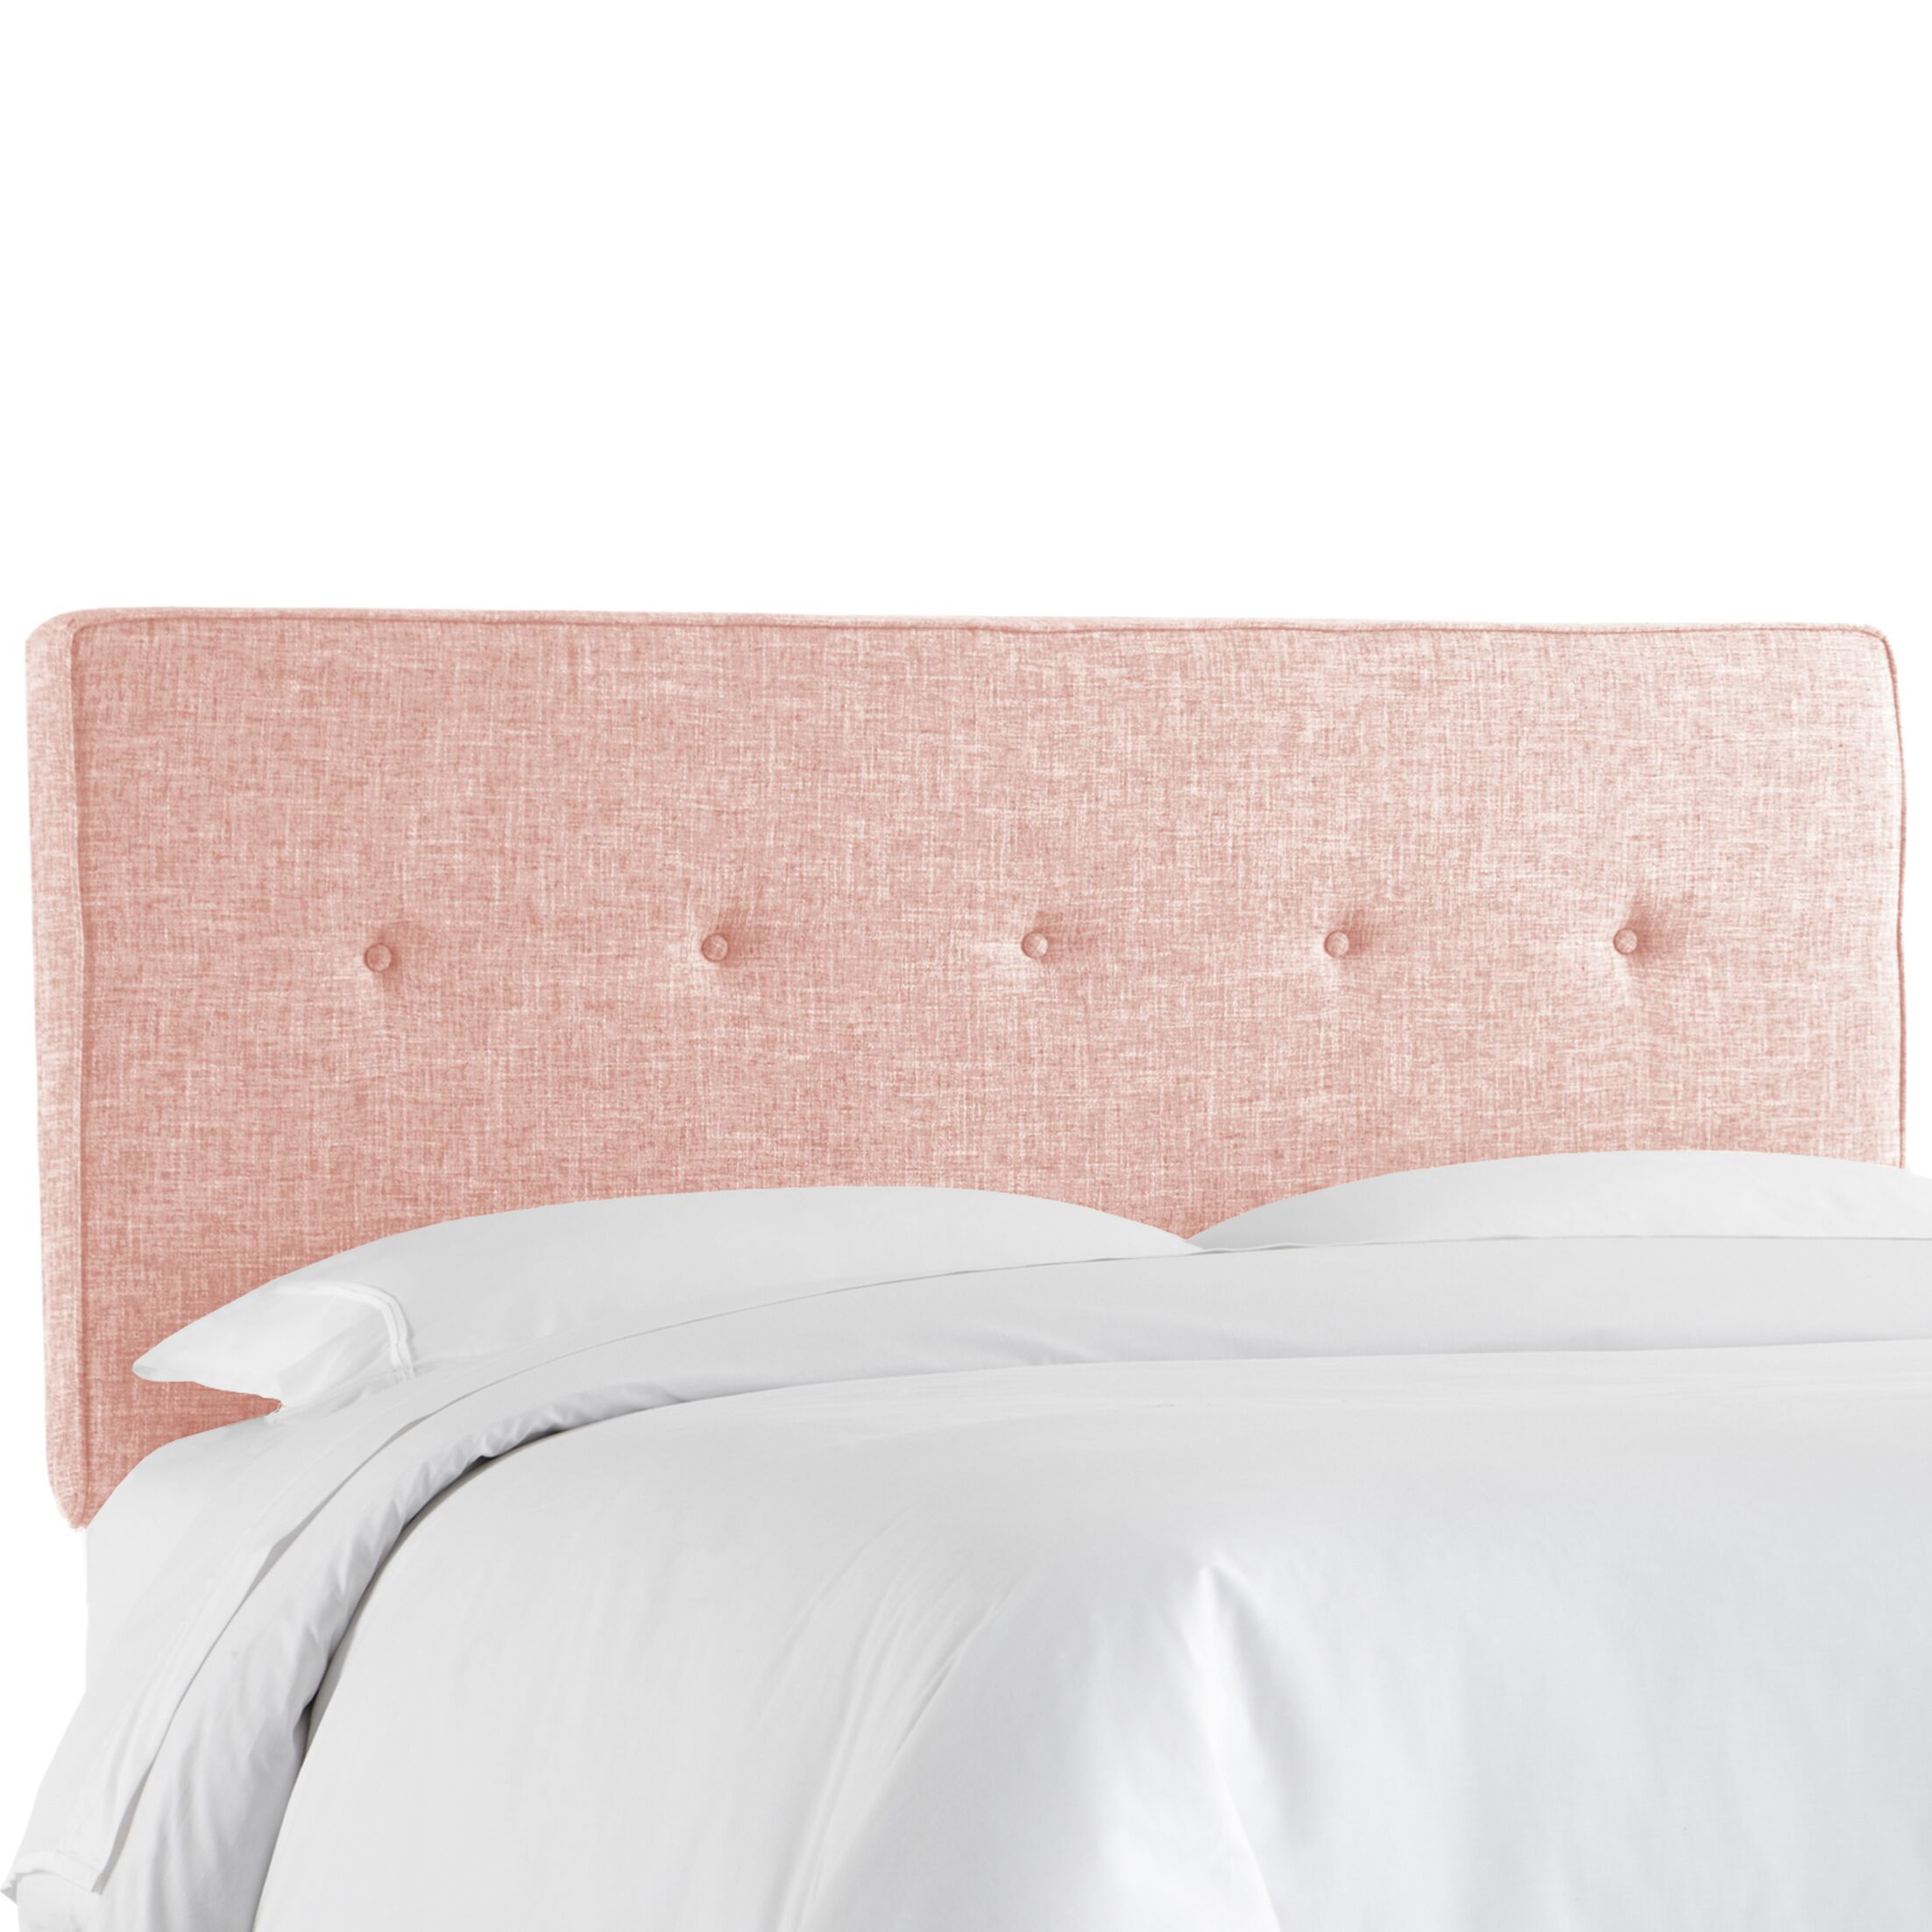 Deforest Tufted Upholstered Panel Headboard Size: Queen, Color: Zuma Rosequartz